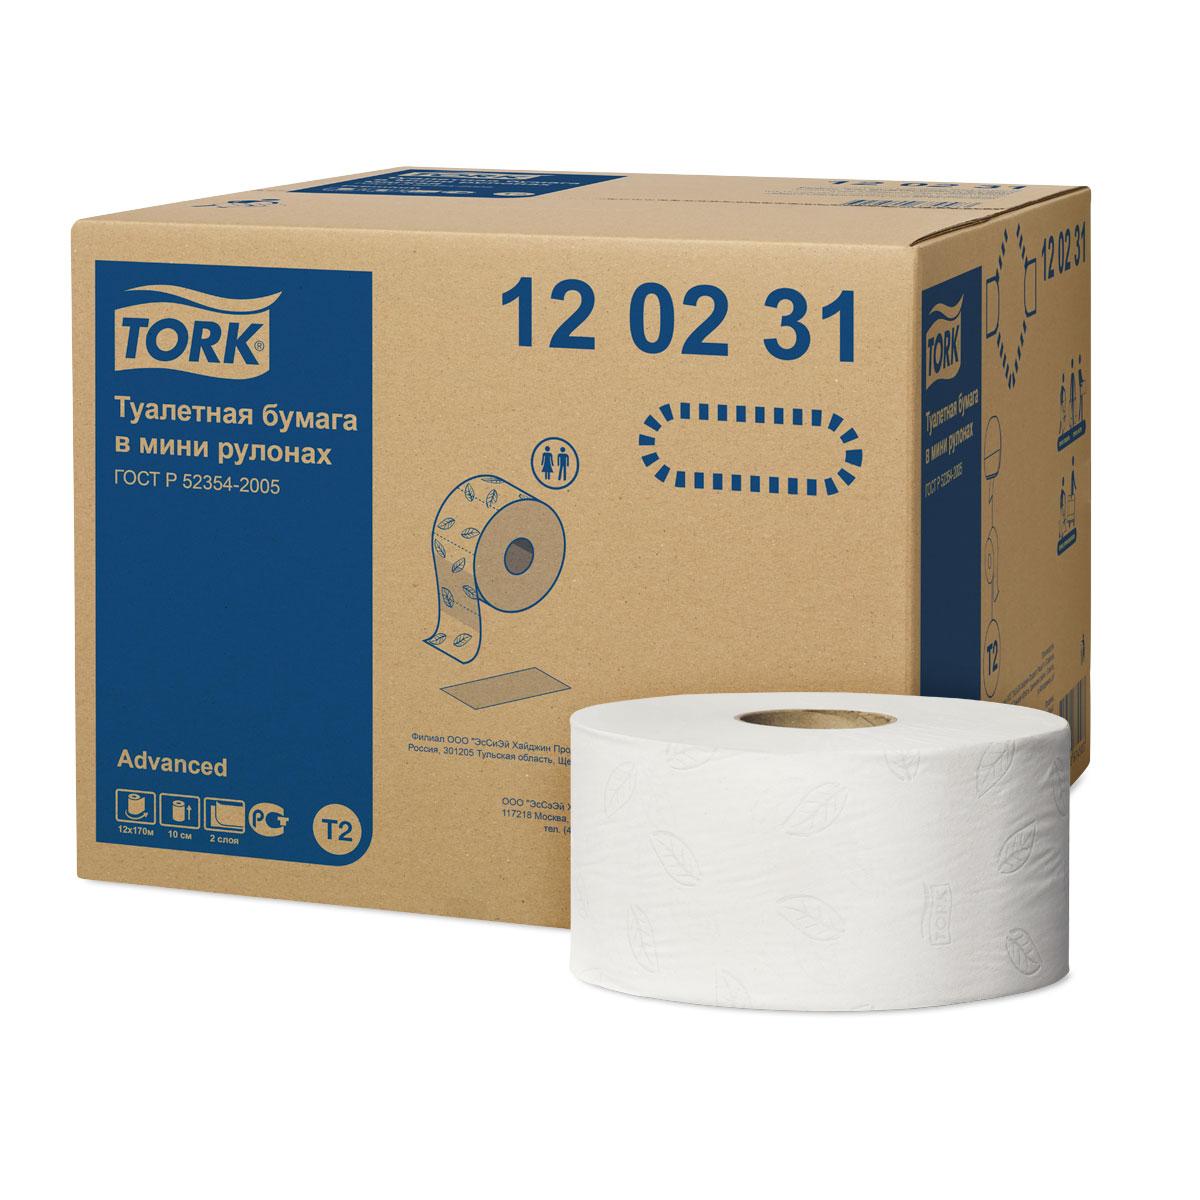 Бумага туалетная  Tork , двухслойная, 12 мини-рулонов - Туалетная бумага